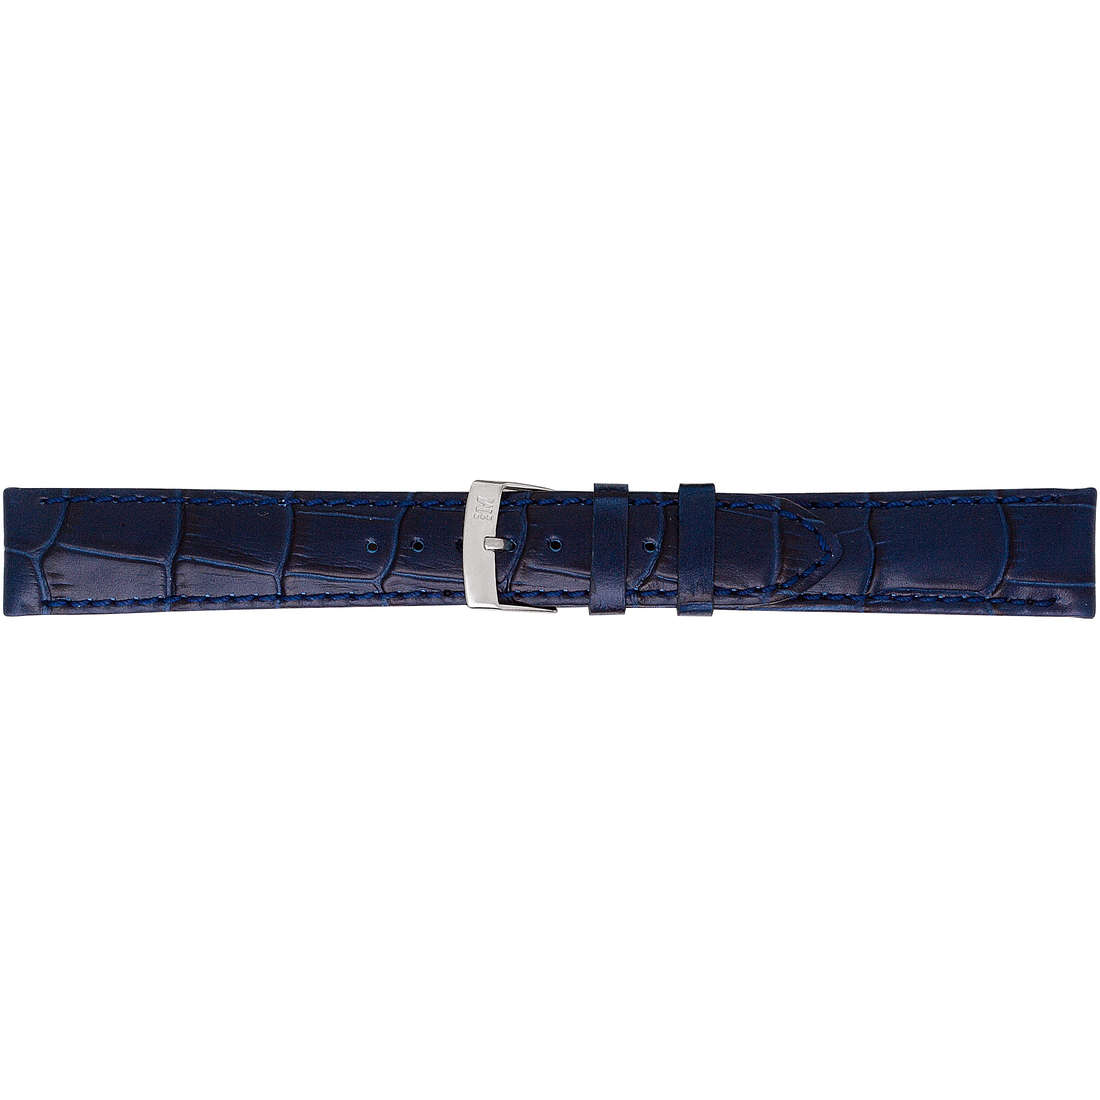 montre bande de montres homme Morellato Performance A01X2704656062CR18